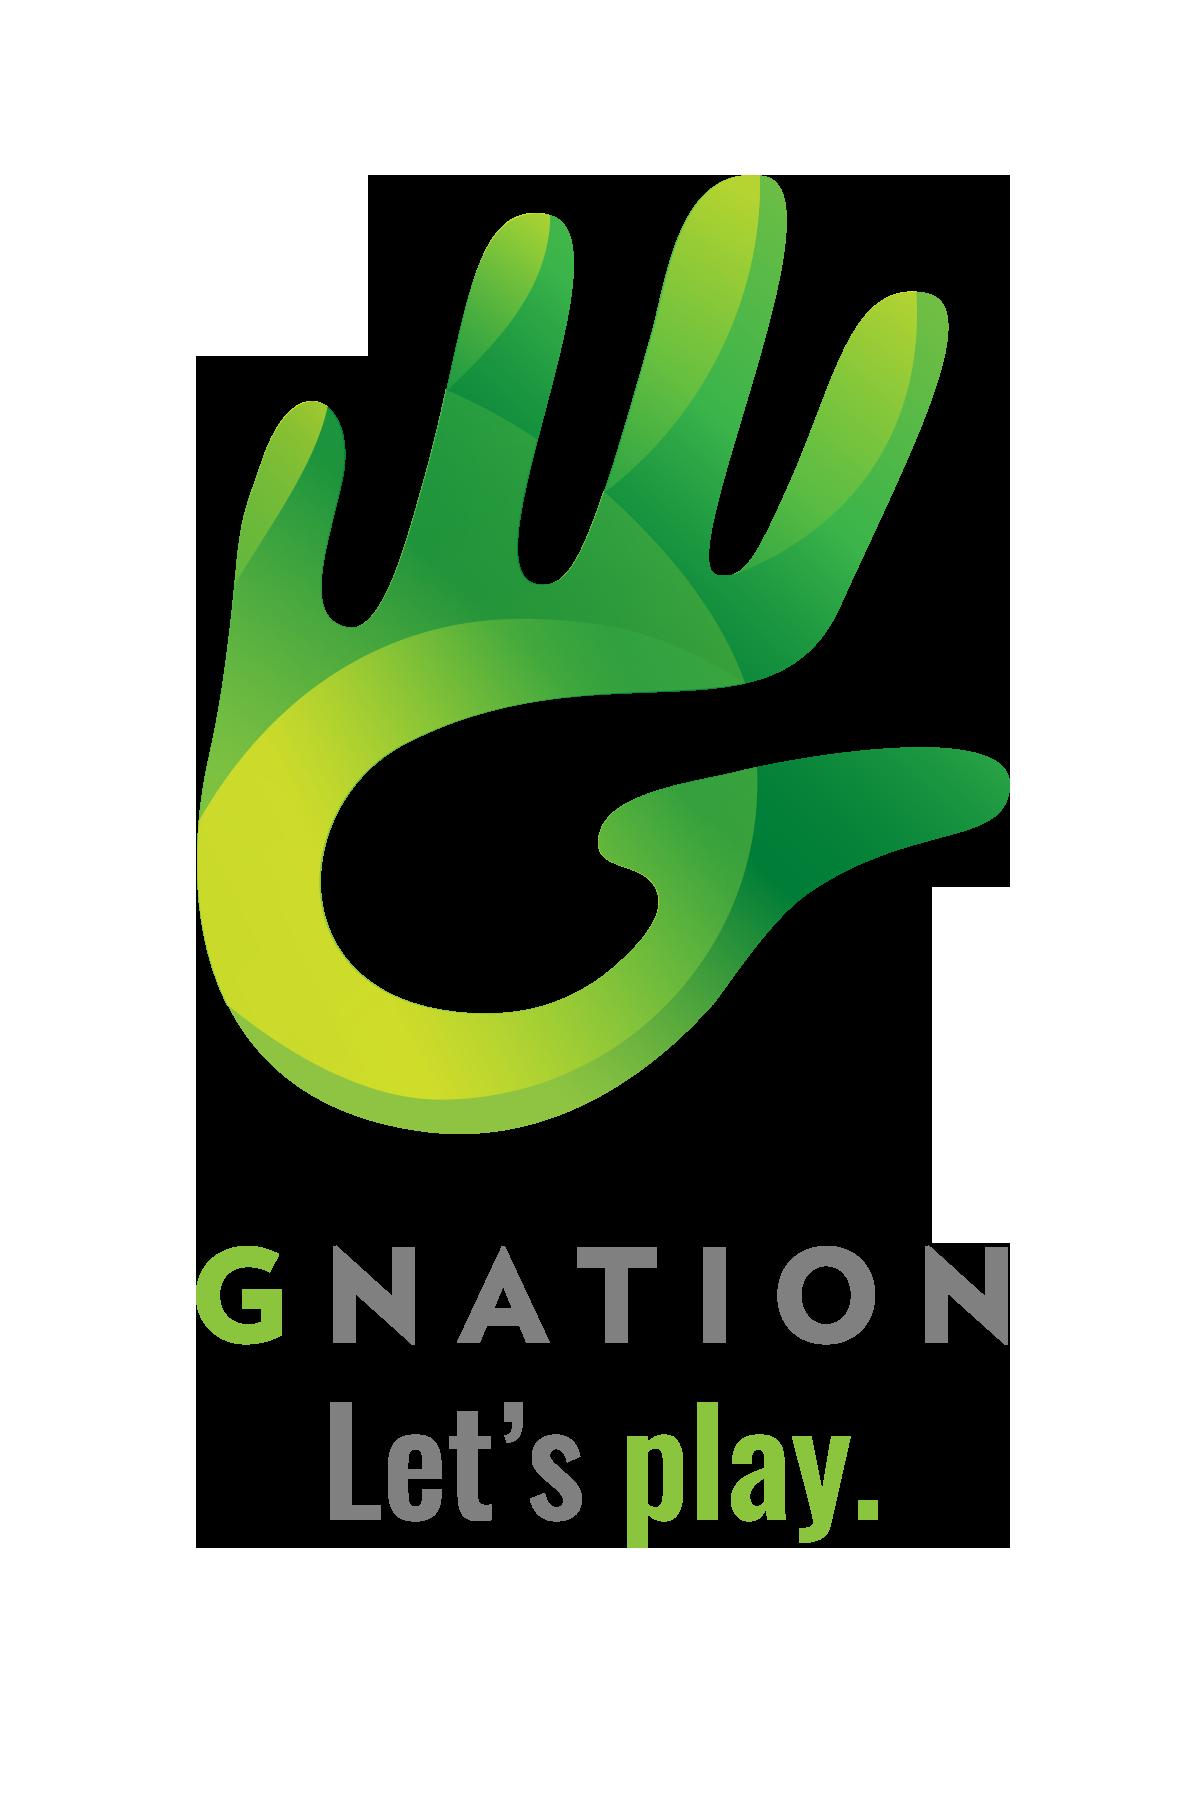 GNAT_Lets play LOGO.png